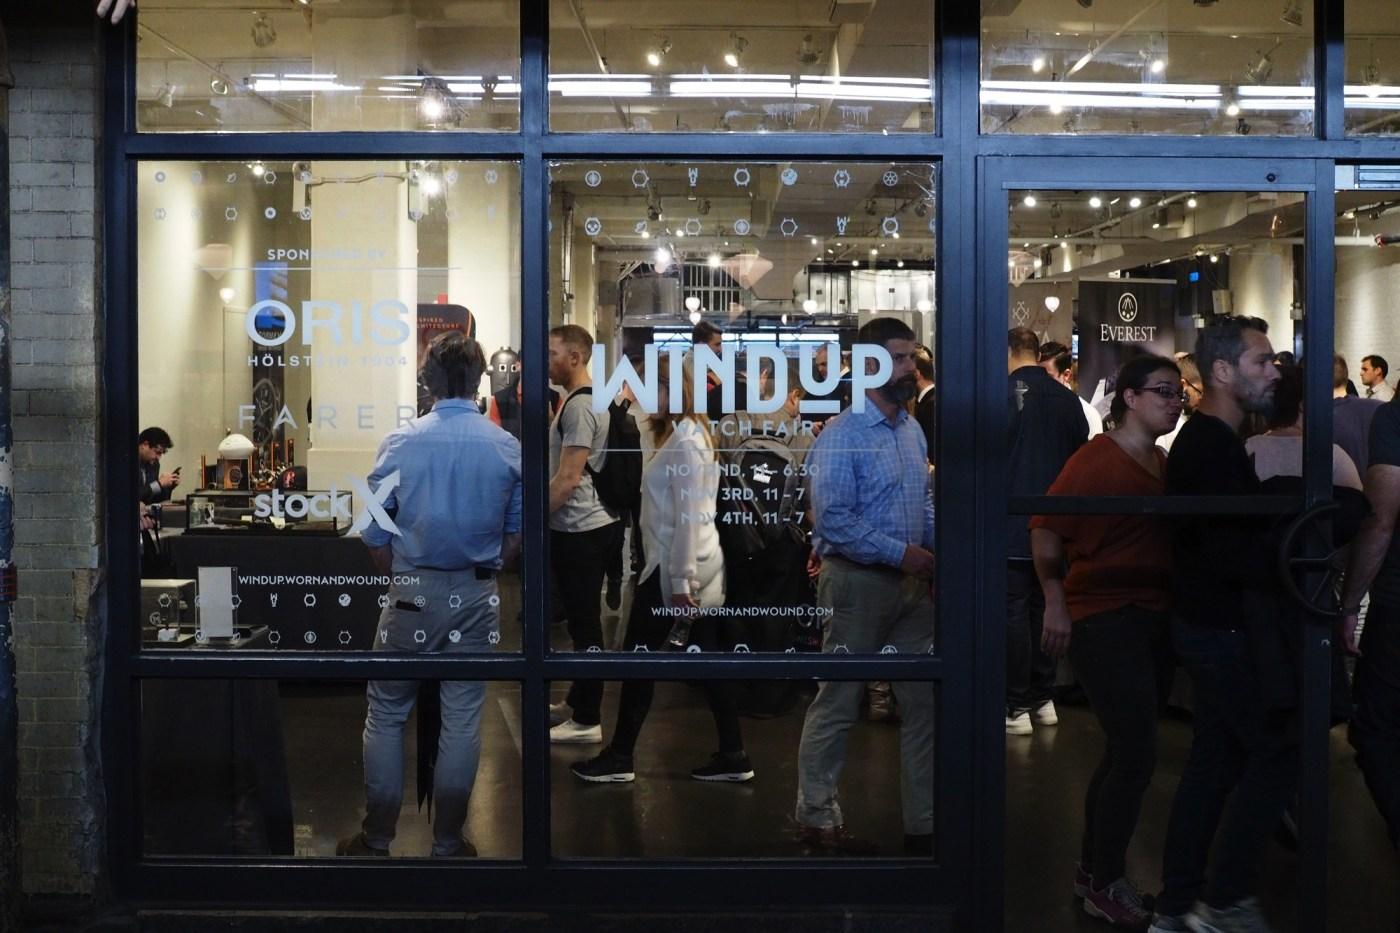 Windup Watch Fair NYC 2018 viewed from inside Chelsea Market